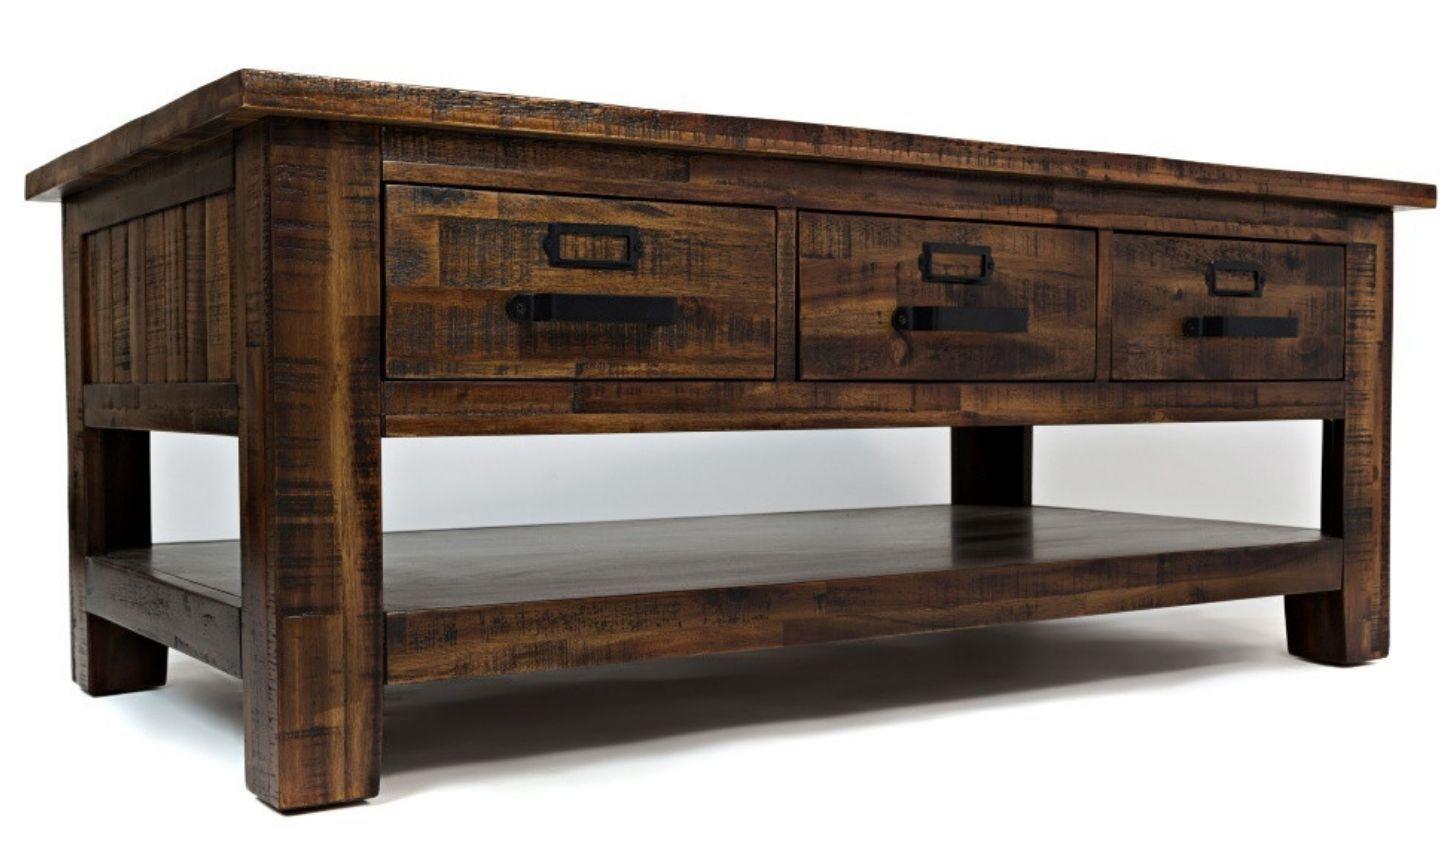 Park Art|My WordPress Blog_Acacia Wood Coffee Table With Drawers